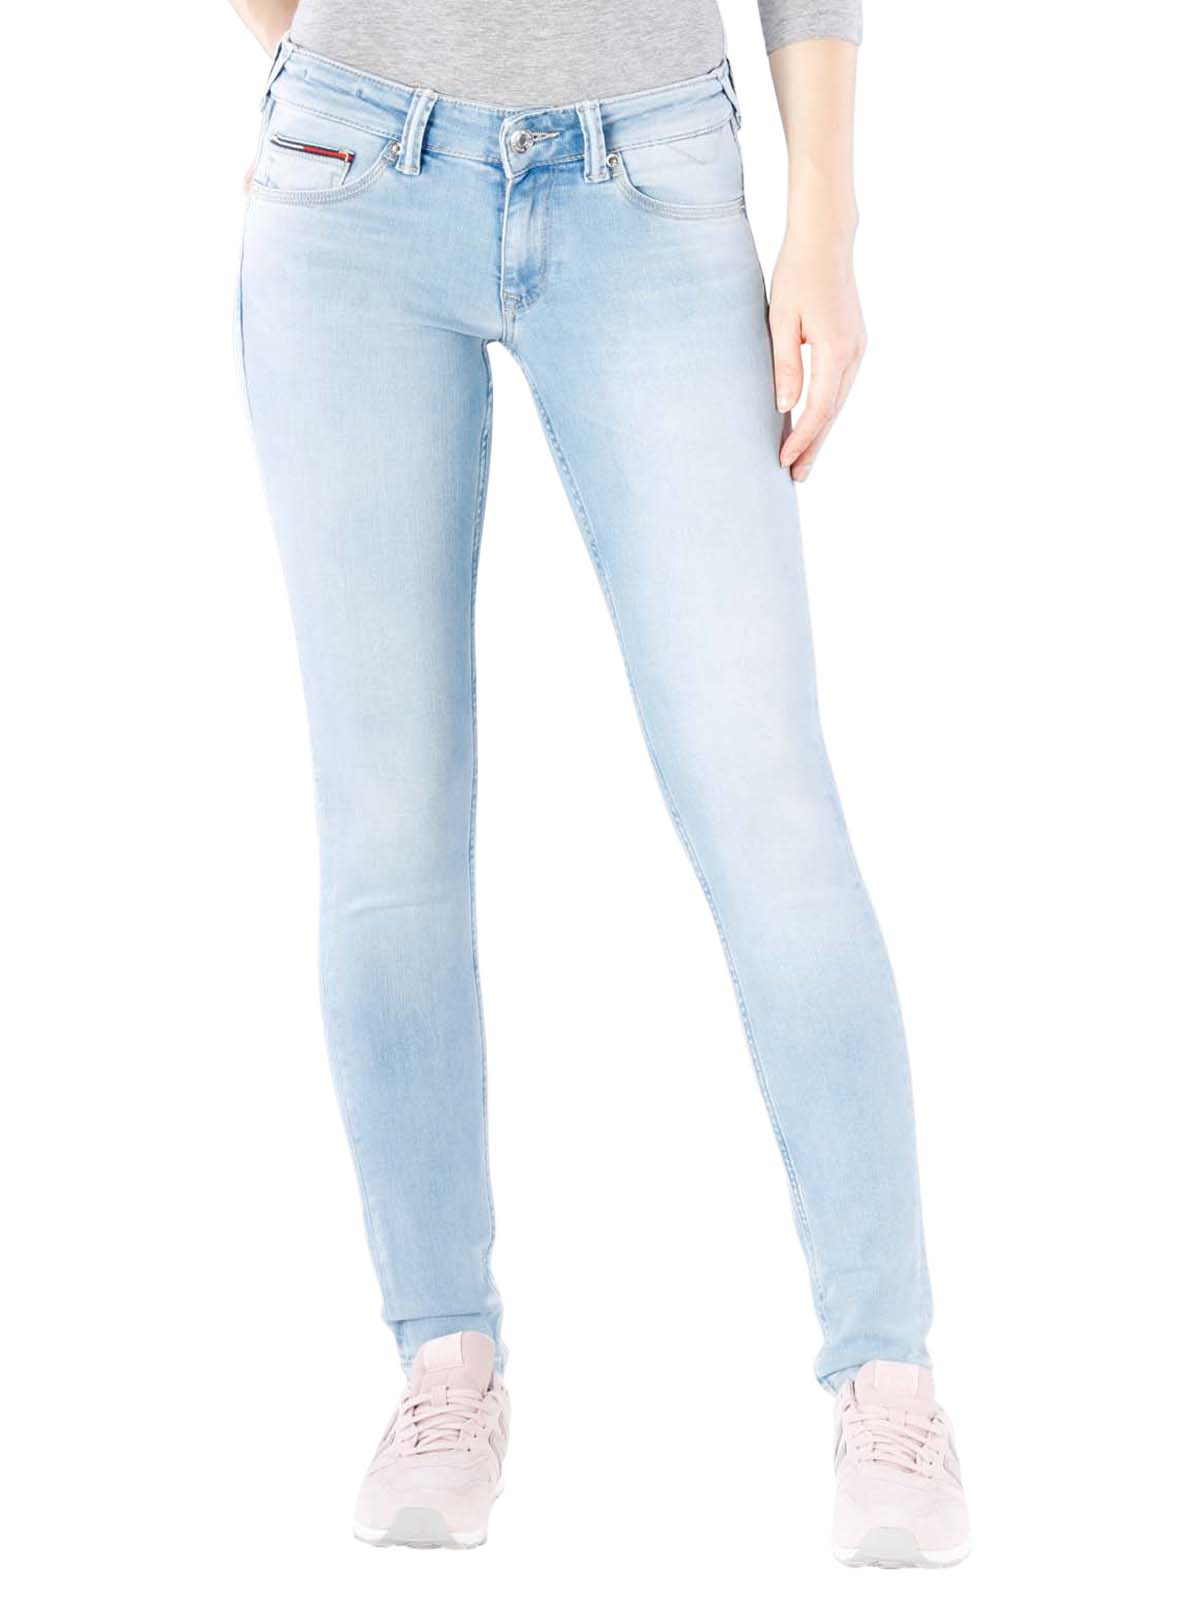 tehtaan aito uusi luettelo erinomainen laatu Tommy Jeans Sophie Skinny florida super light blue W26/L34